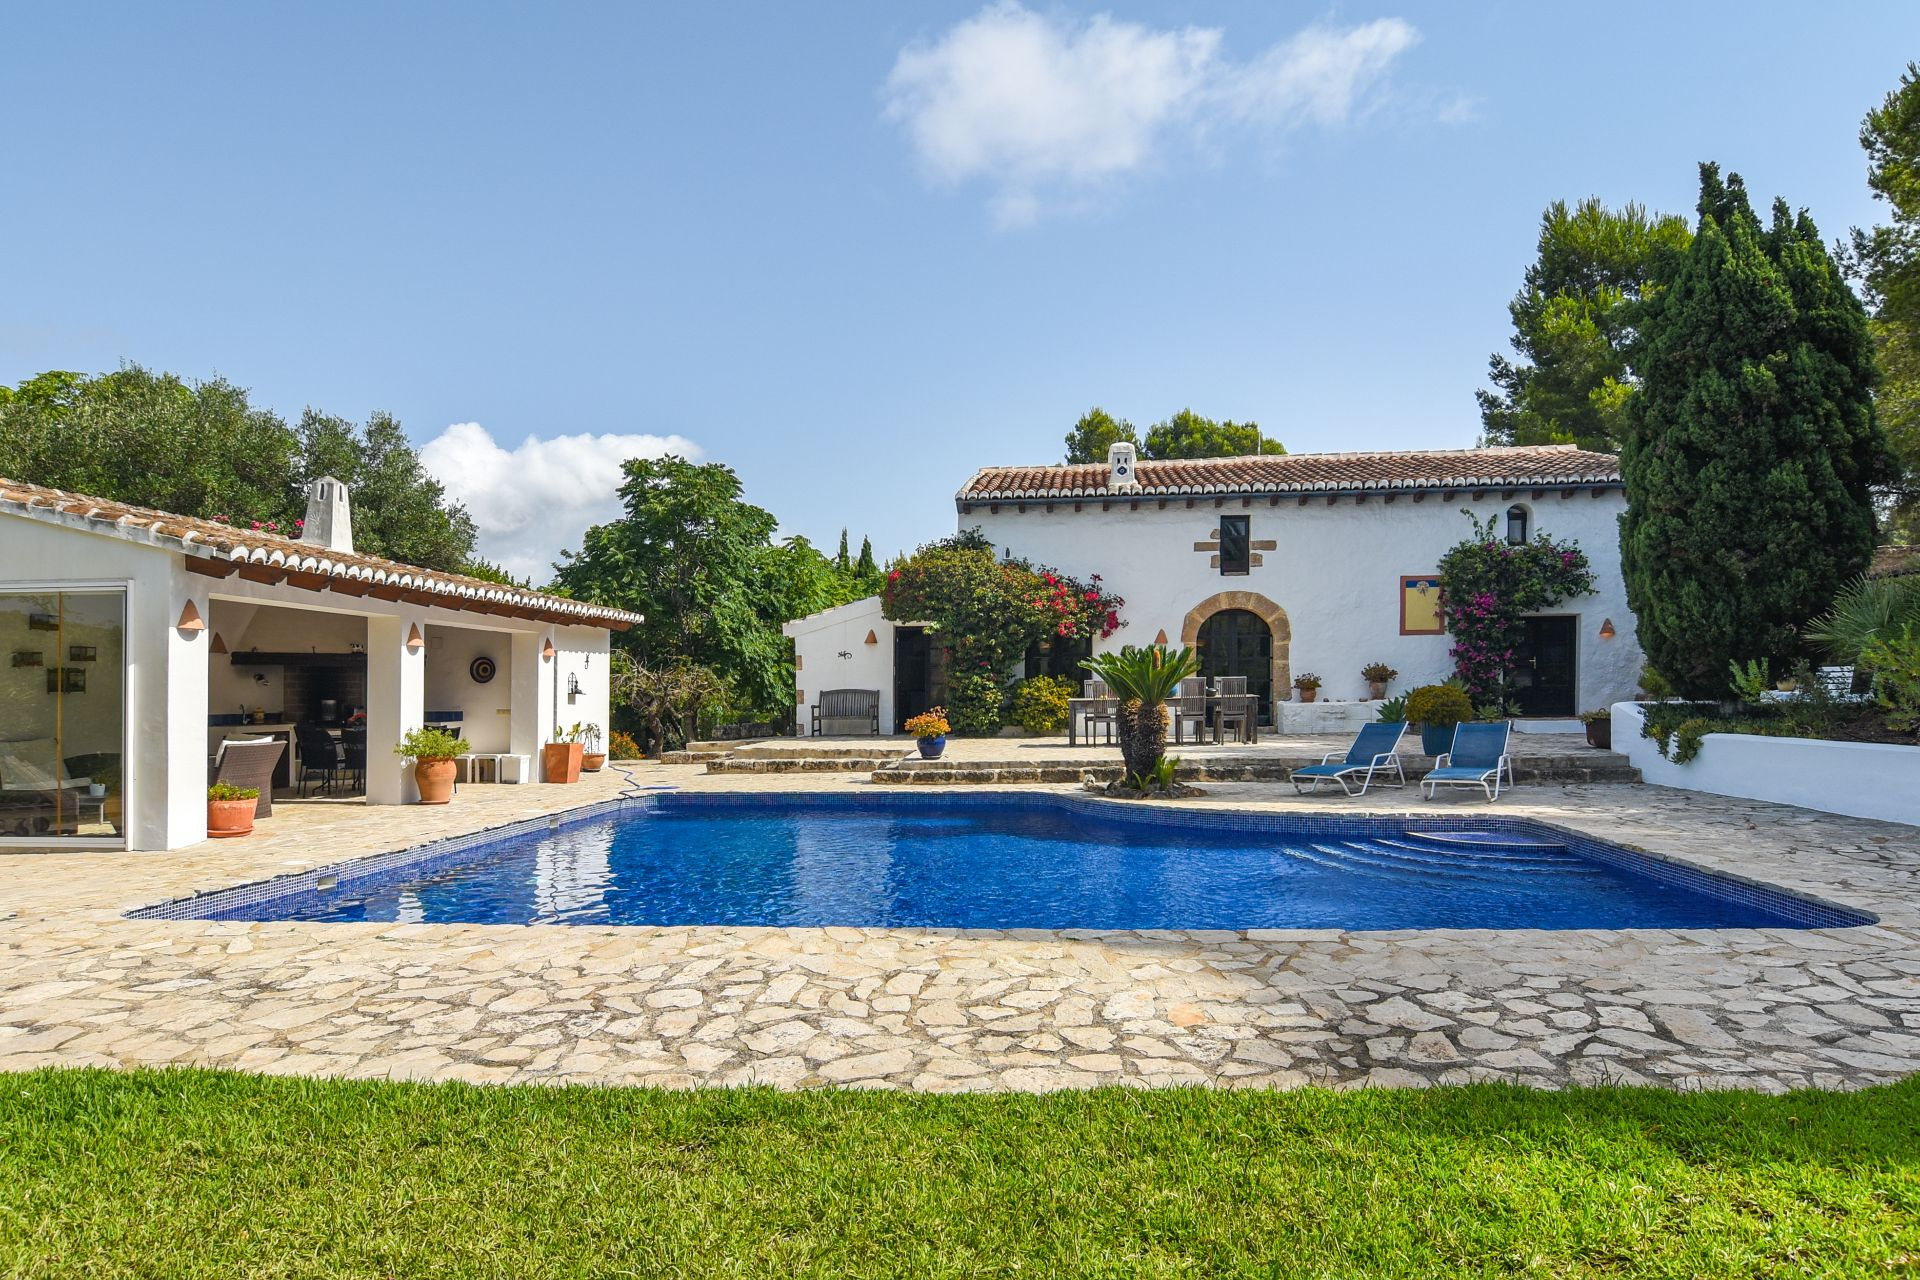 Casa / Chalet en Jávea, Cansalades, venta